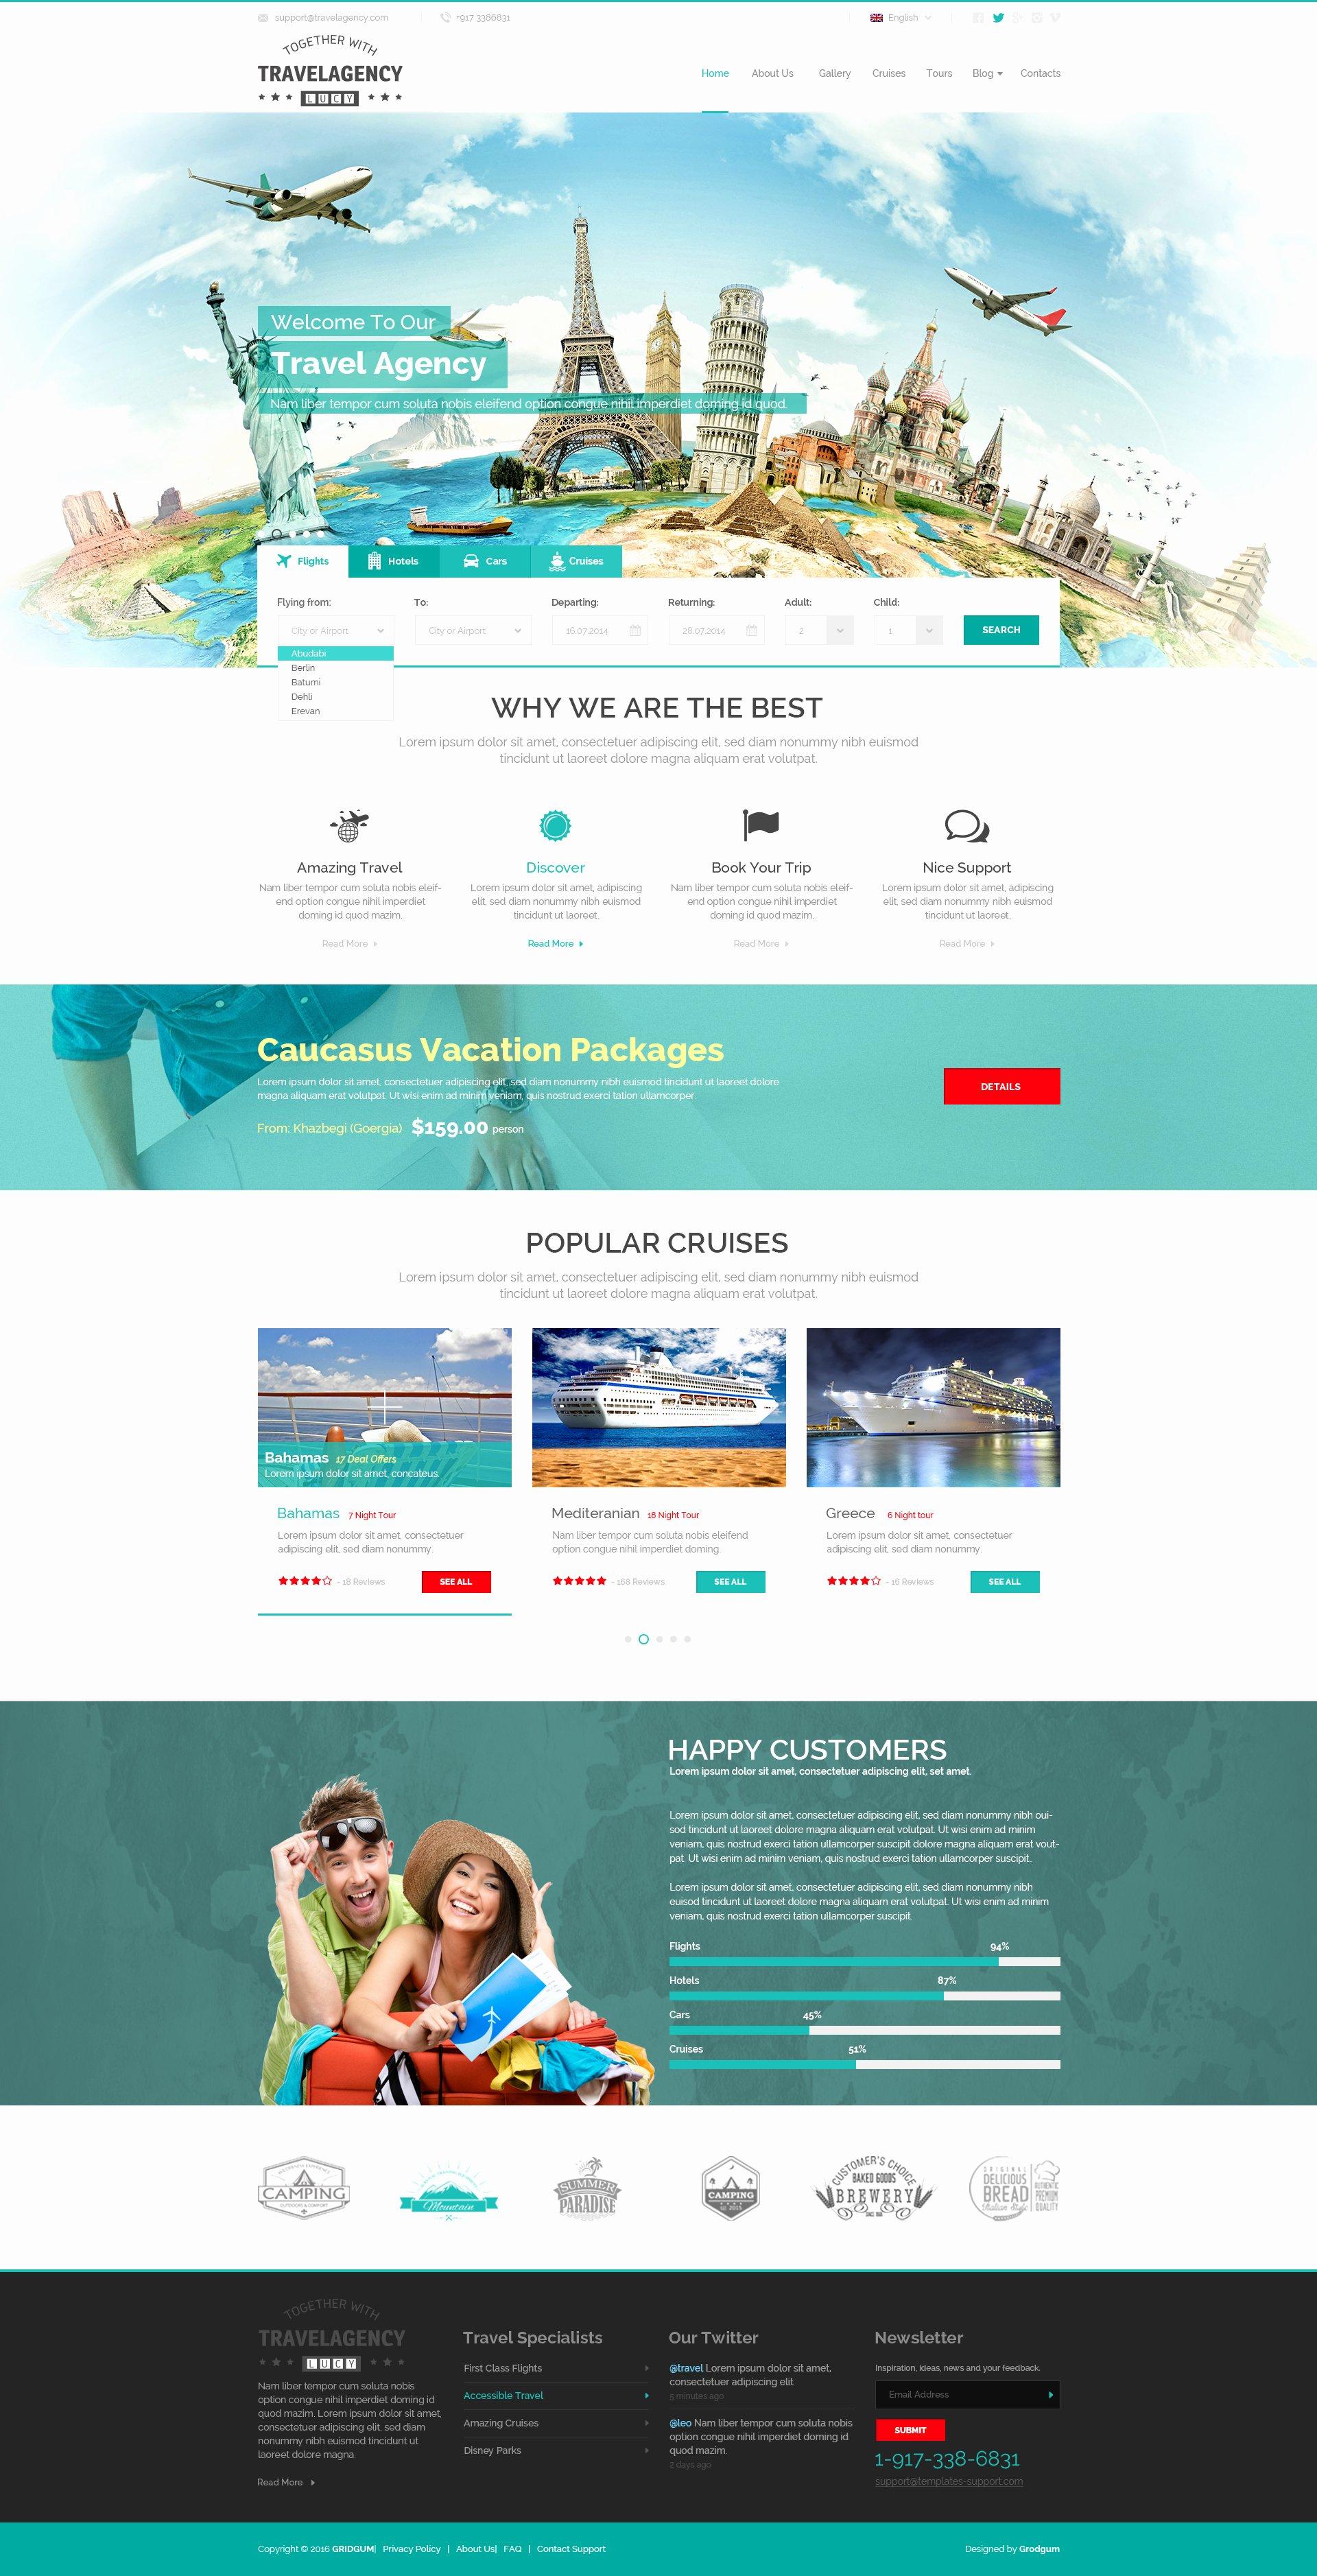 Travel Agent Website Template Fresh Travel Agency Website Template theme